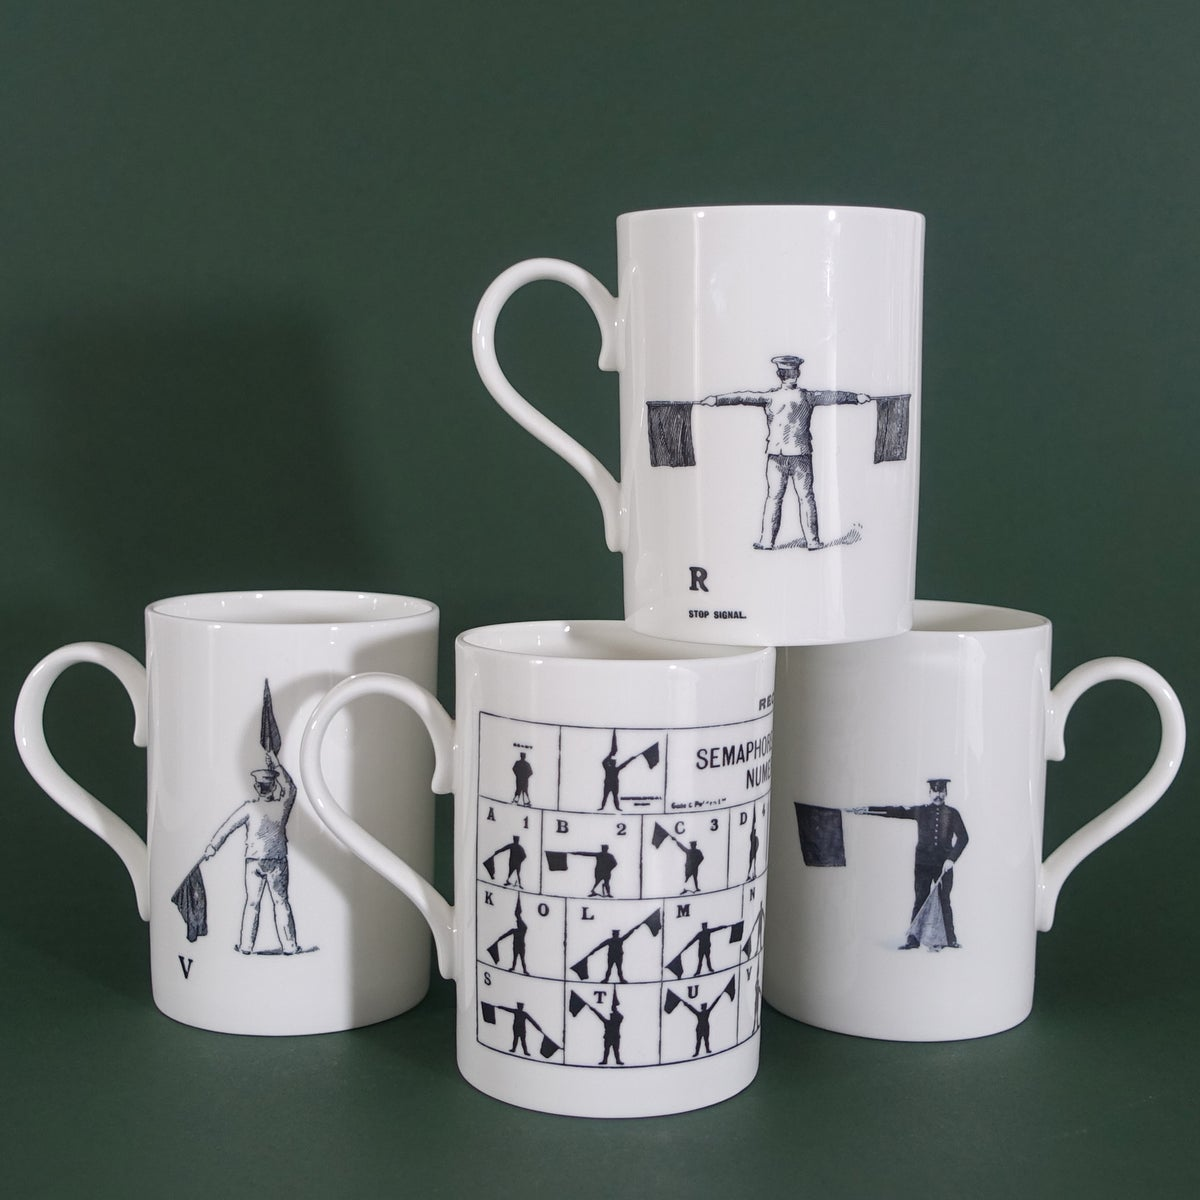 Image of Semaphore Mug samples